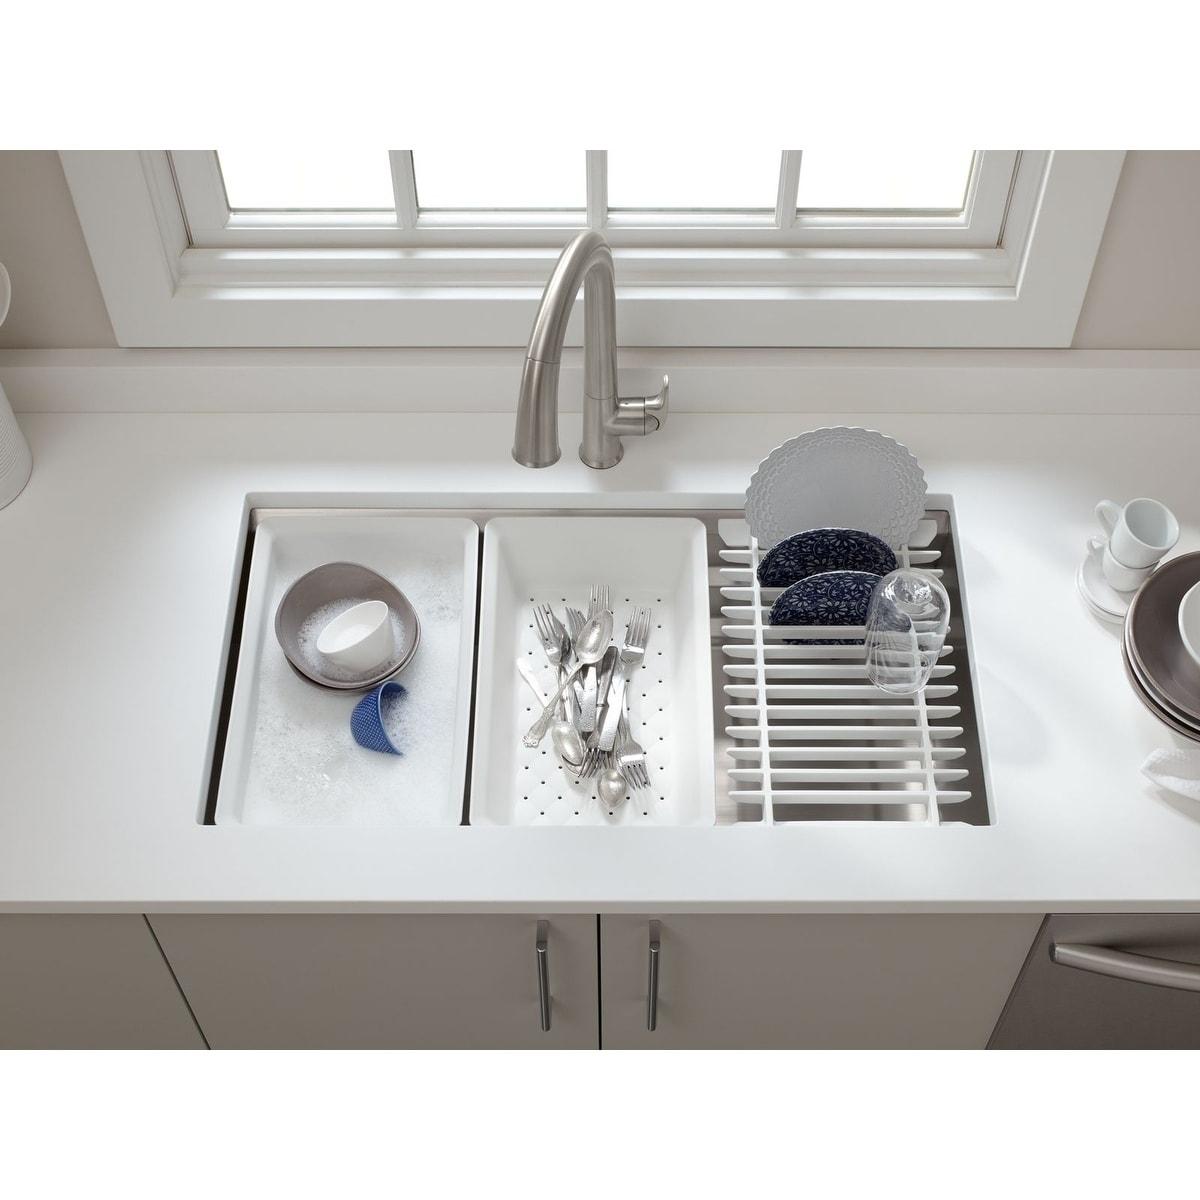 Kohler Prolific 33 X 17 3 4 X 10 15 16 Undermount Single Bowl Kitchen Sink With Accessories K 5540 Na Overstock 22736752